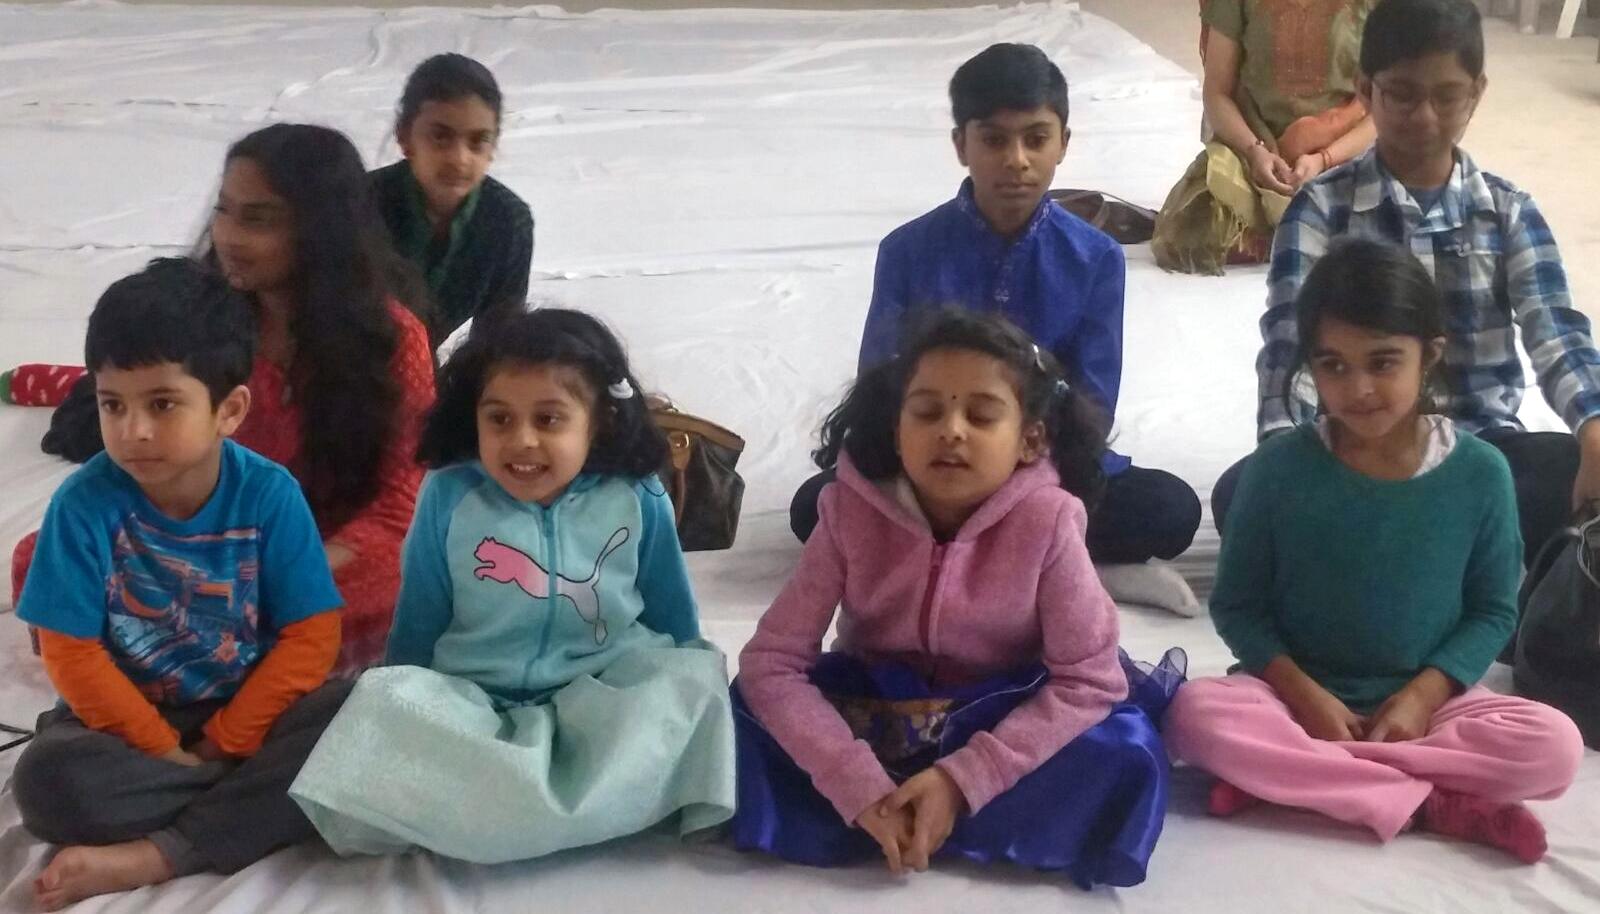 Children smiling and singing together